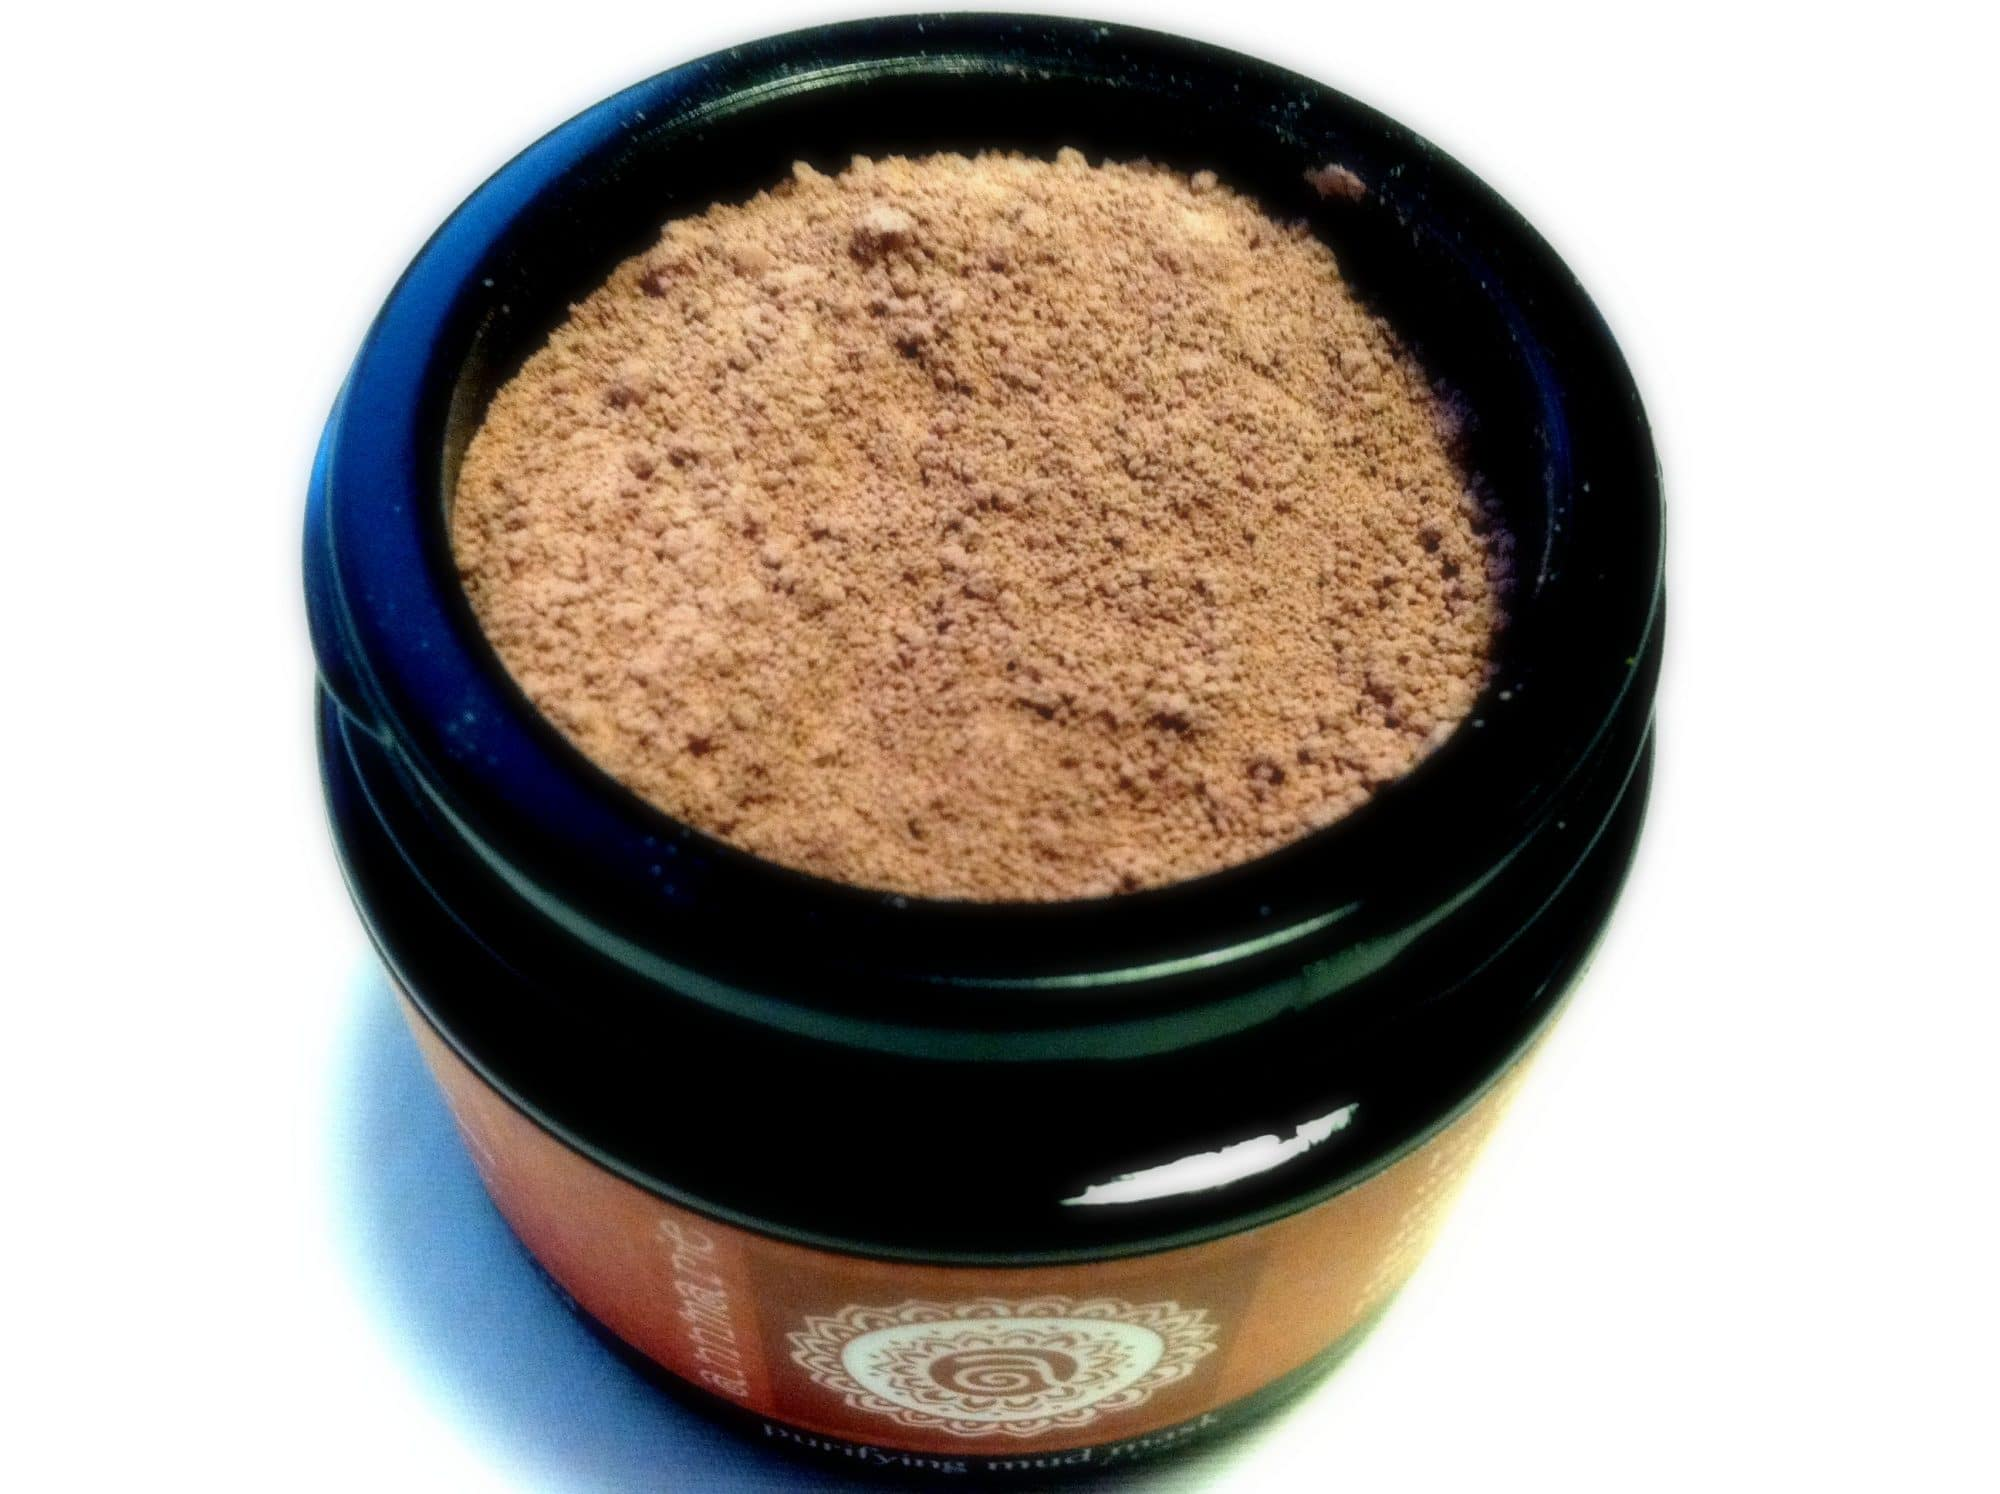 Herb of the Week: Rhassoul Clay